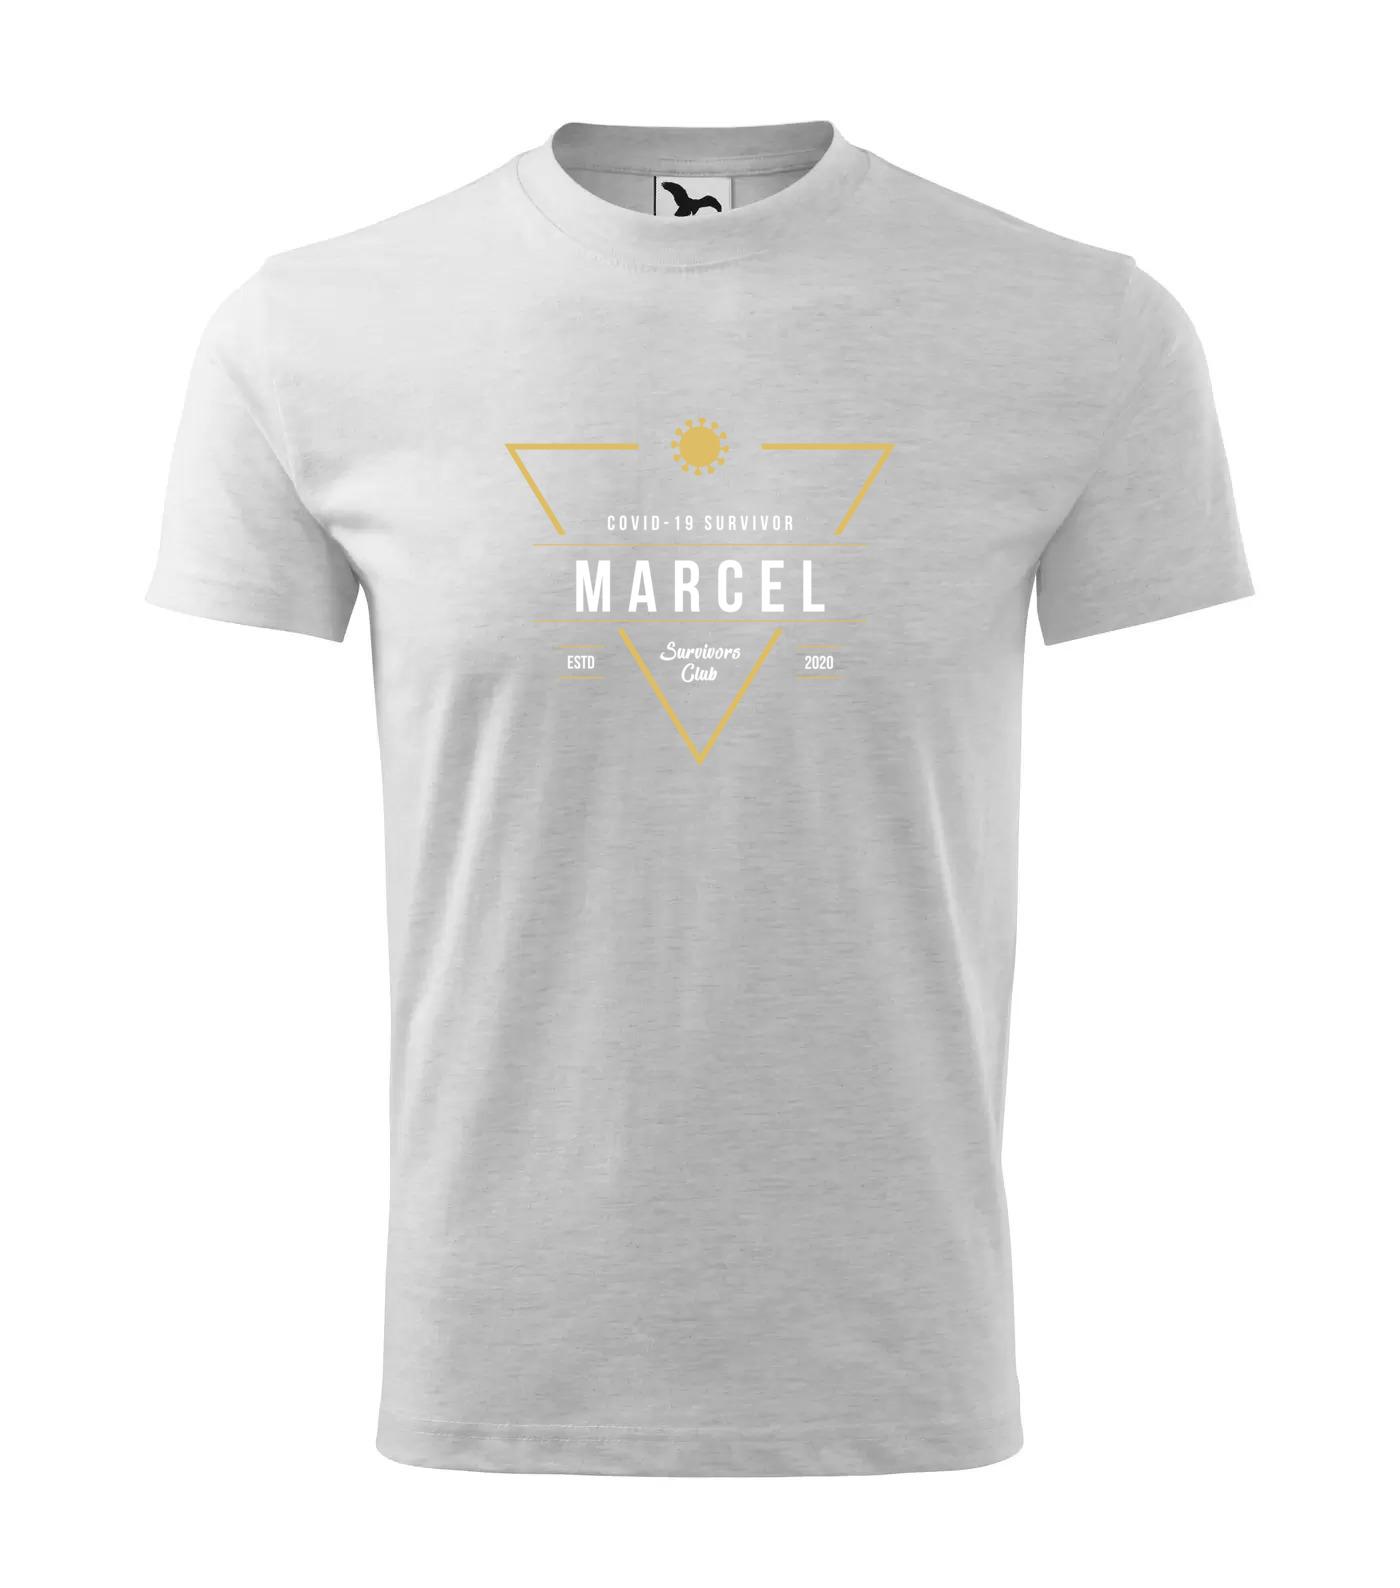 Tričko Survivor Club Marcel